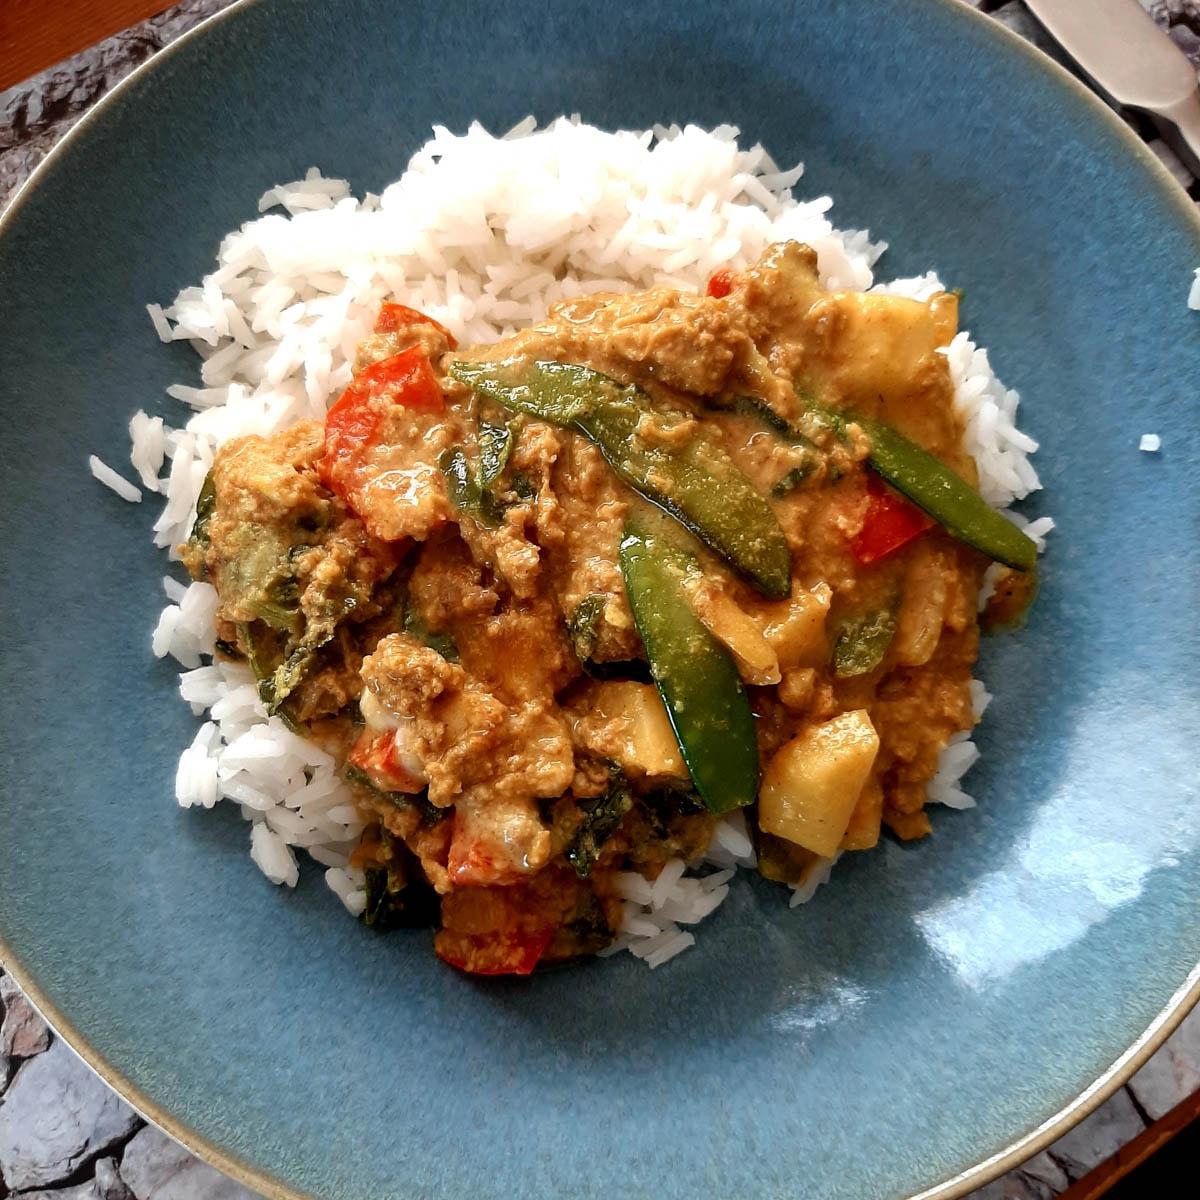 recept-curry-peultjes-meiraap-sugarsnap-1